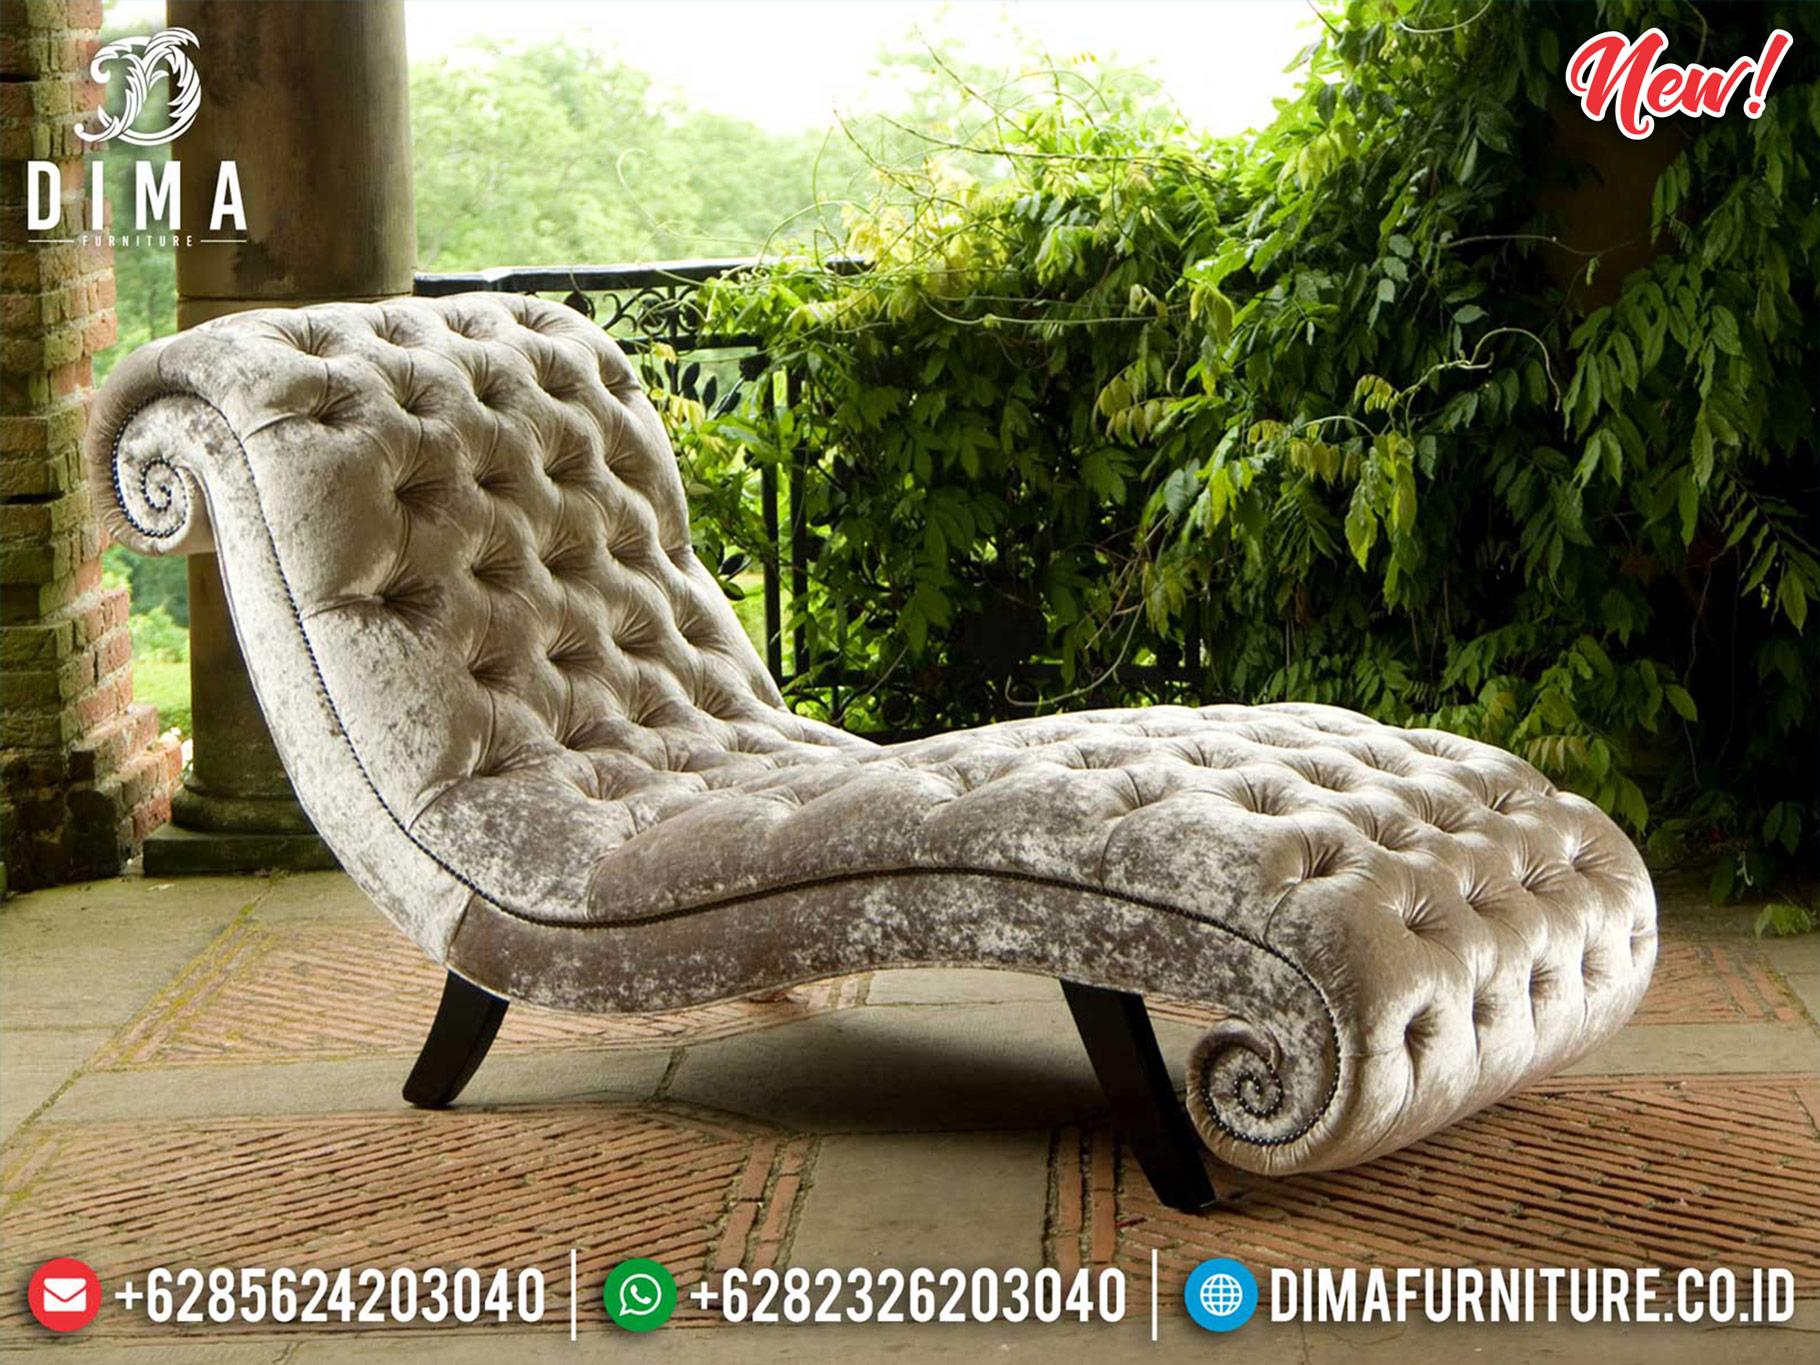 Sofa Santai Mewah Luxury Furniture Jepara Design Interior Inspiring ST-1131